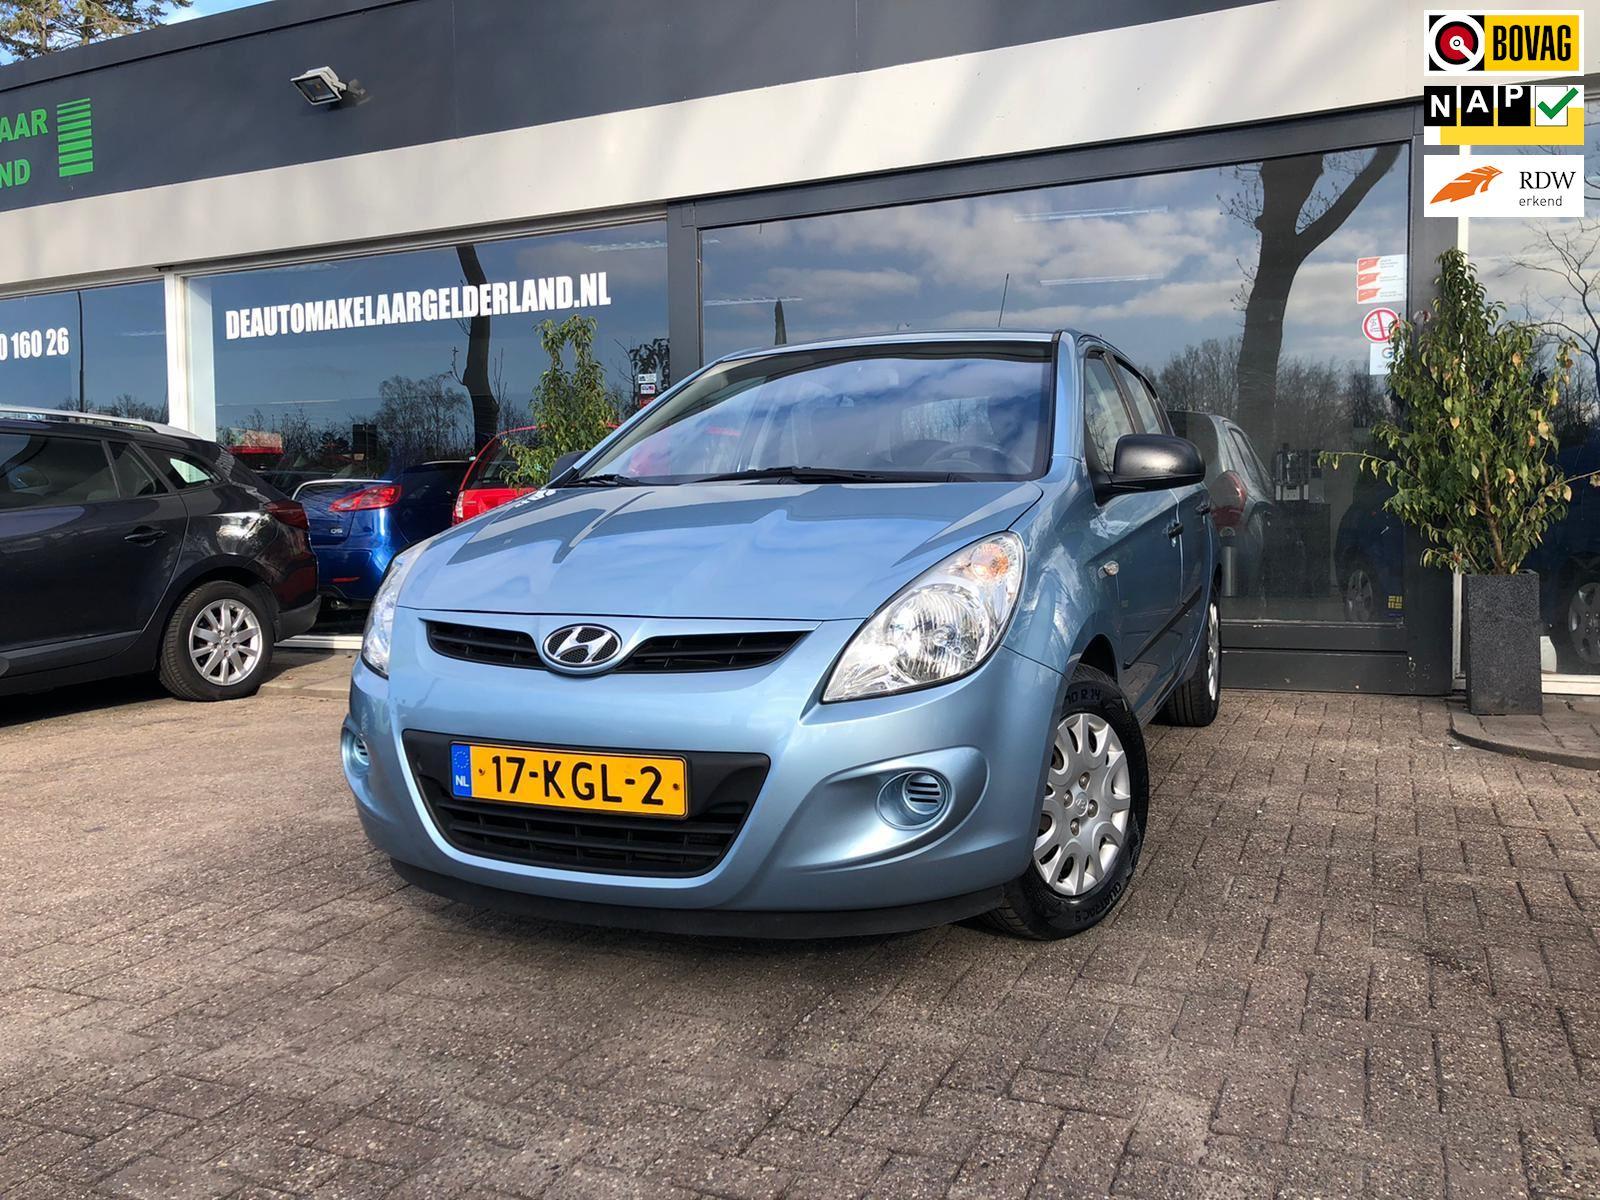 Hyundai I20 occasion - De Automakelaar Gelderland